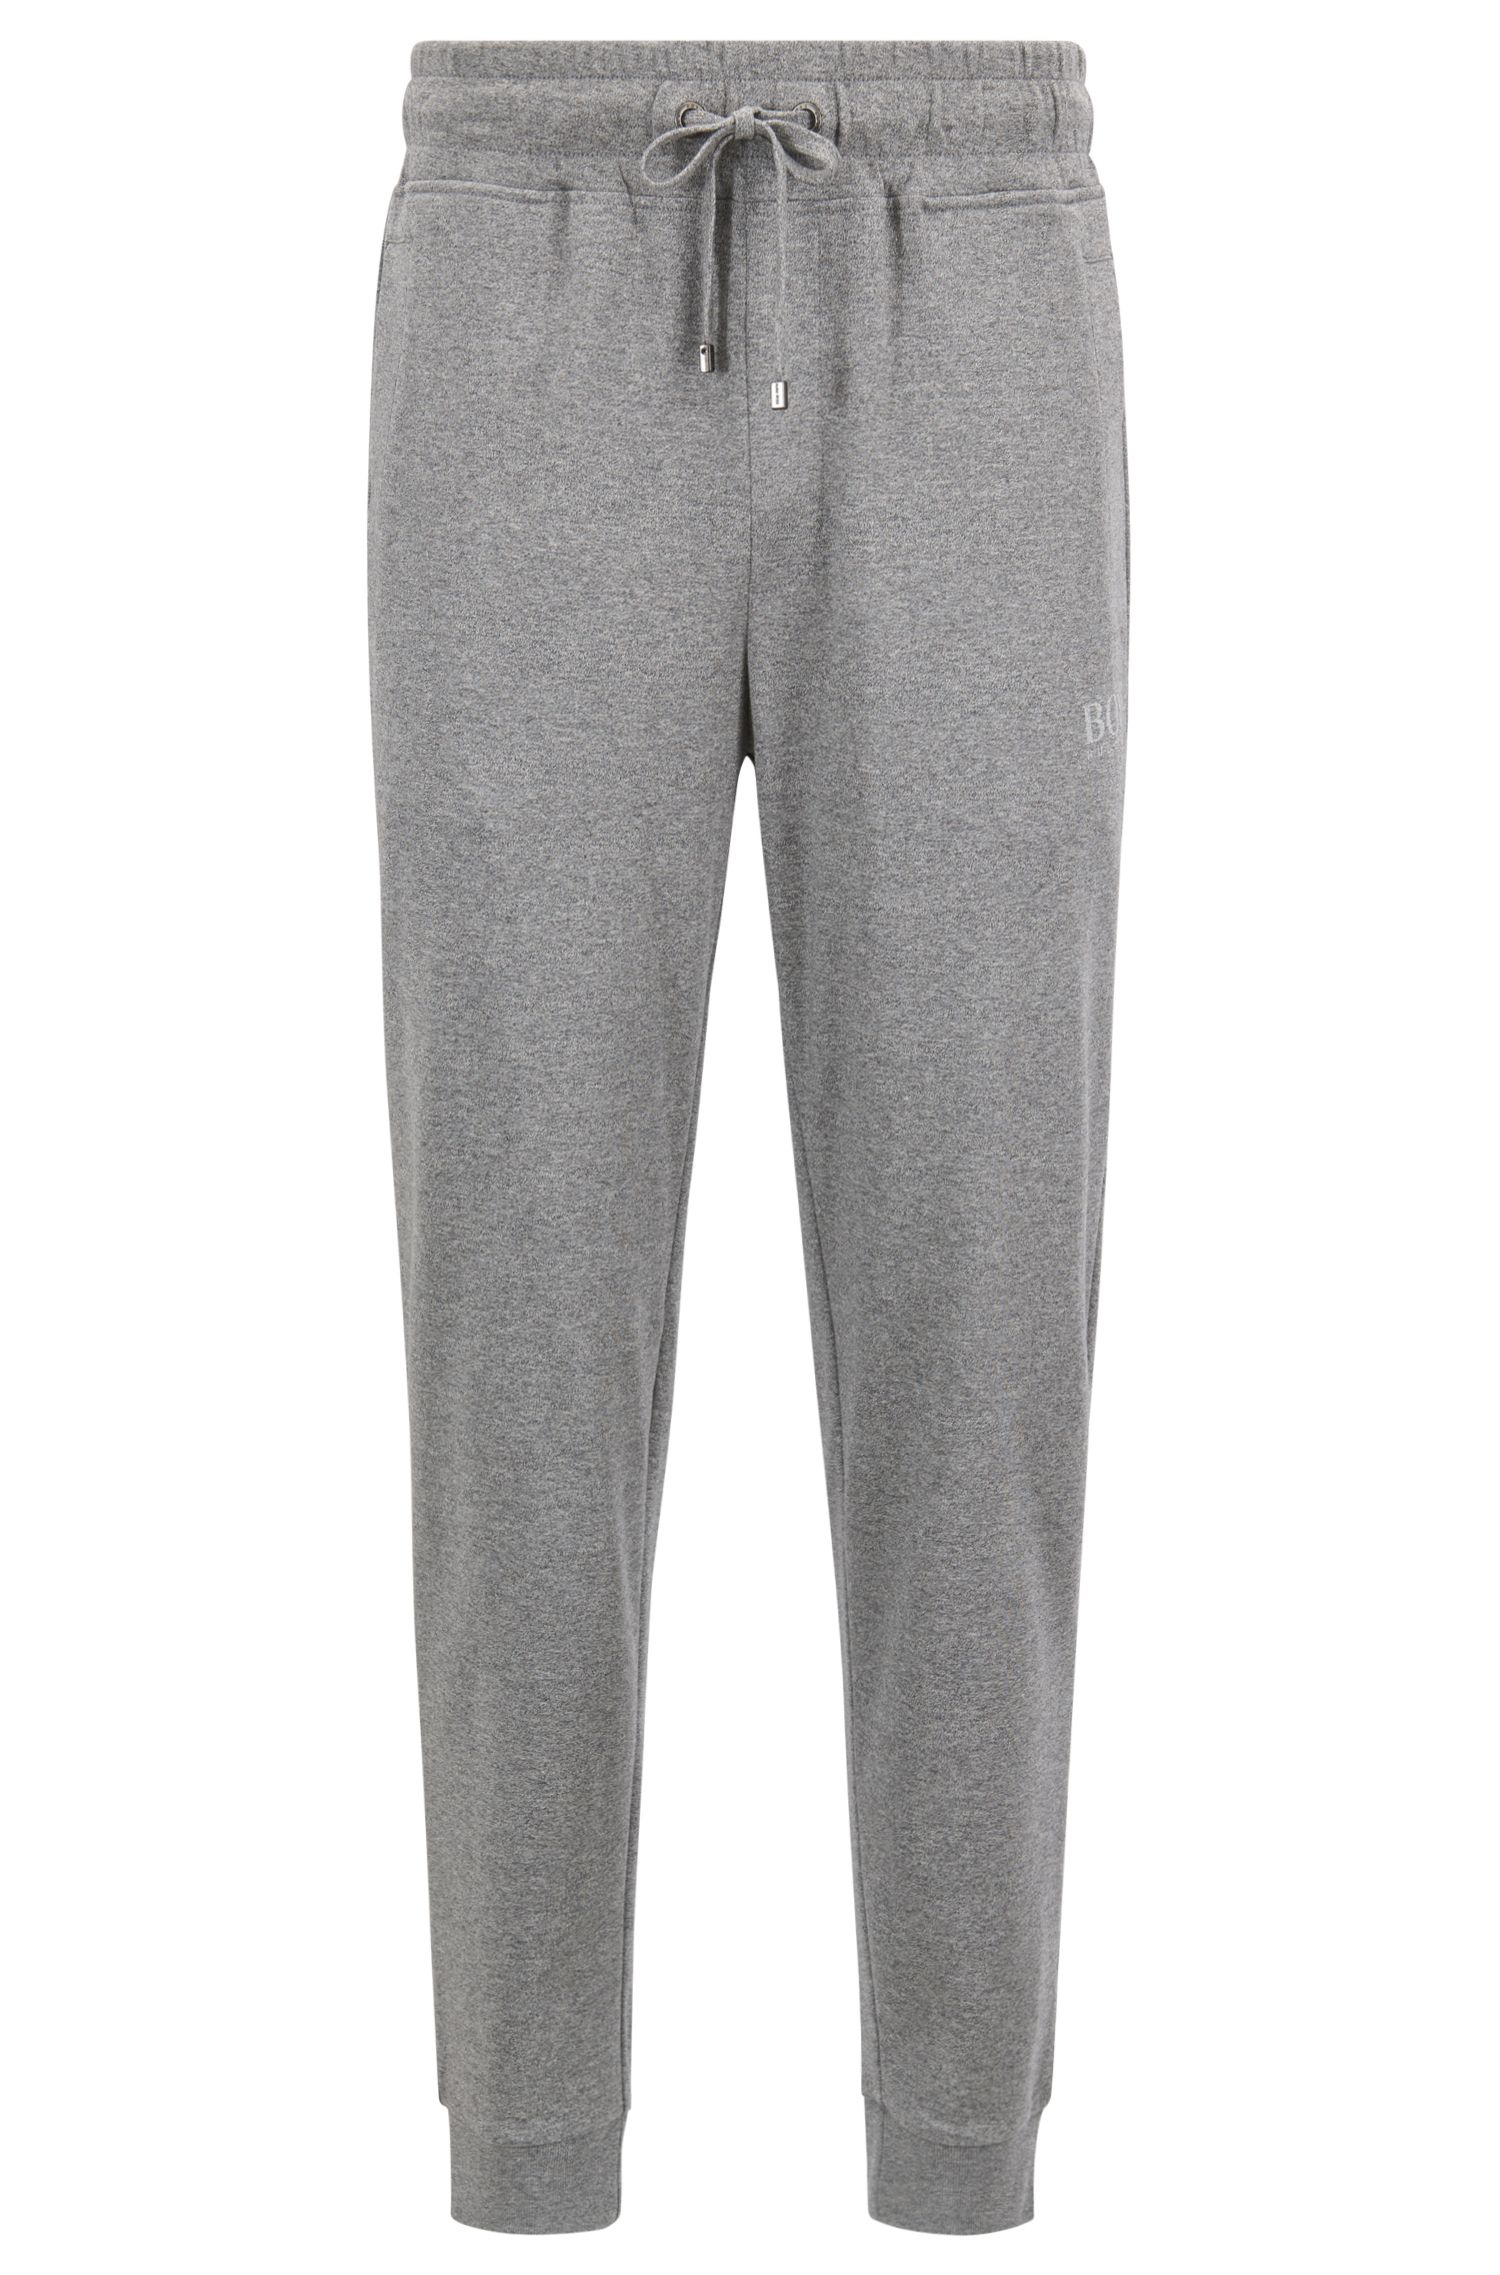 Pantalones loungewear en punto sencillo de algodón jaspeado, Gris